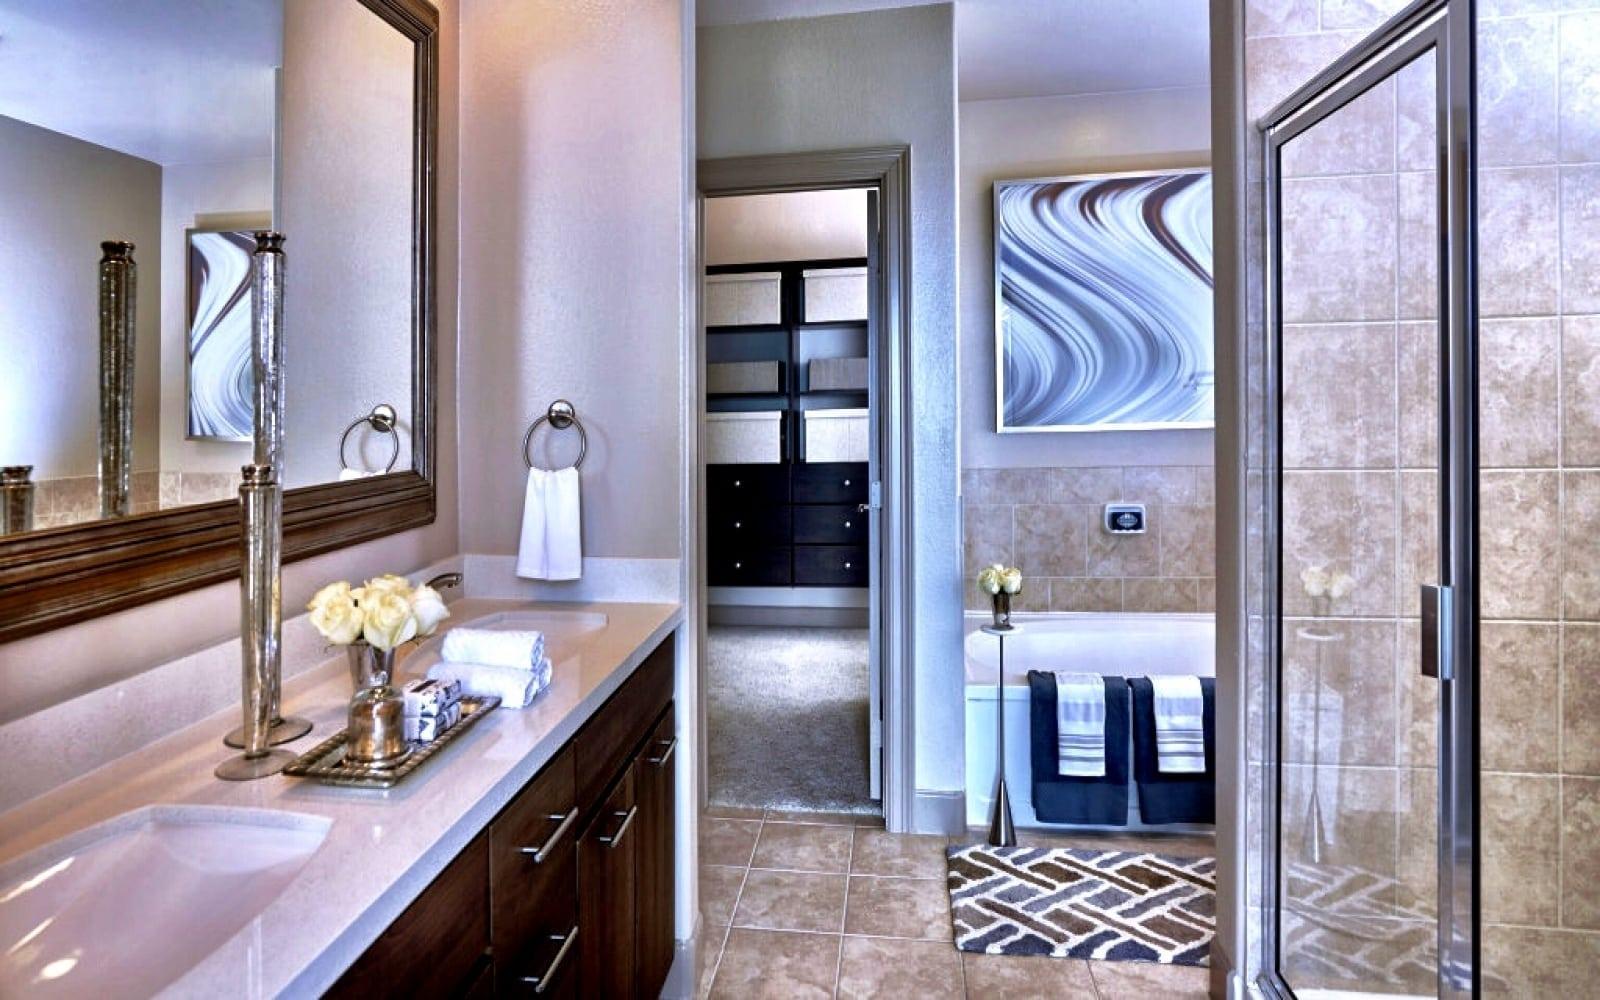 Texas,2 Bedrooms Bedrooms,2 BathroomsBathrooms,Apartment,8,2082